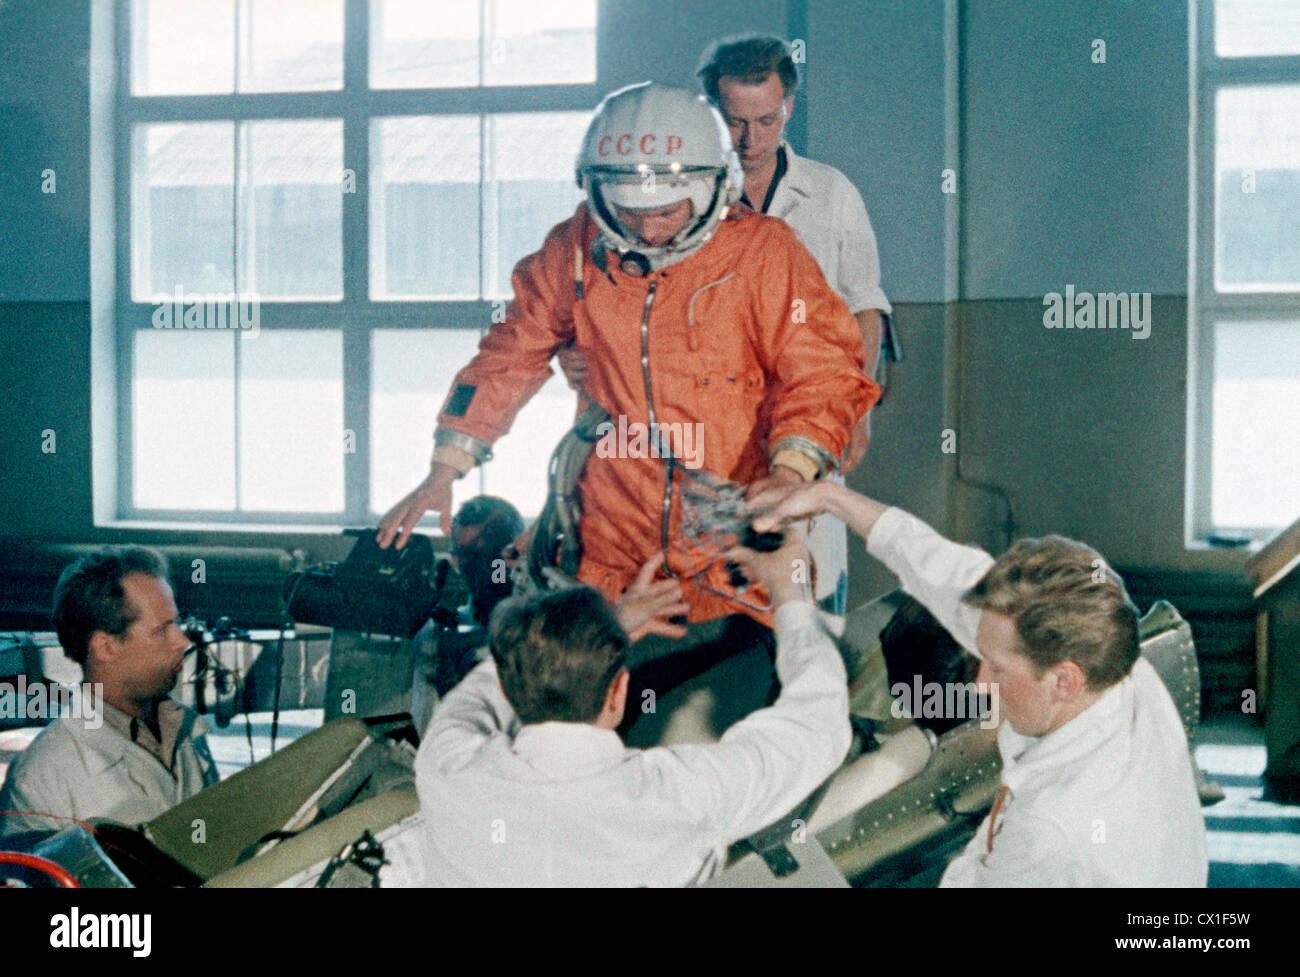 Baikonur Cosmodrome. Kazakh SSR. USSR. Preparation of first cosmonaut Yuri Gagarin to the space flight. Photo TASS - Stock Image